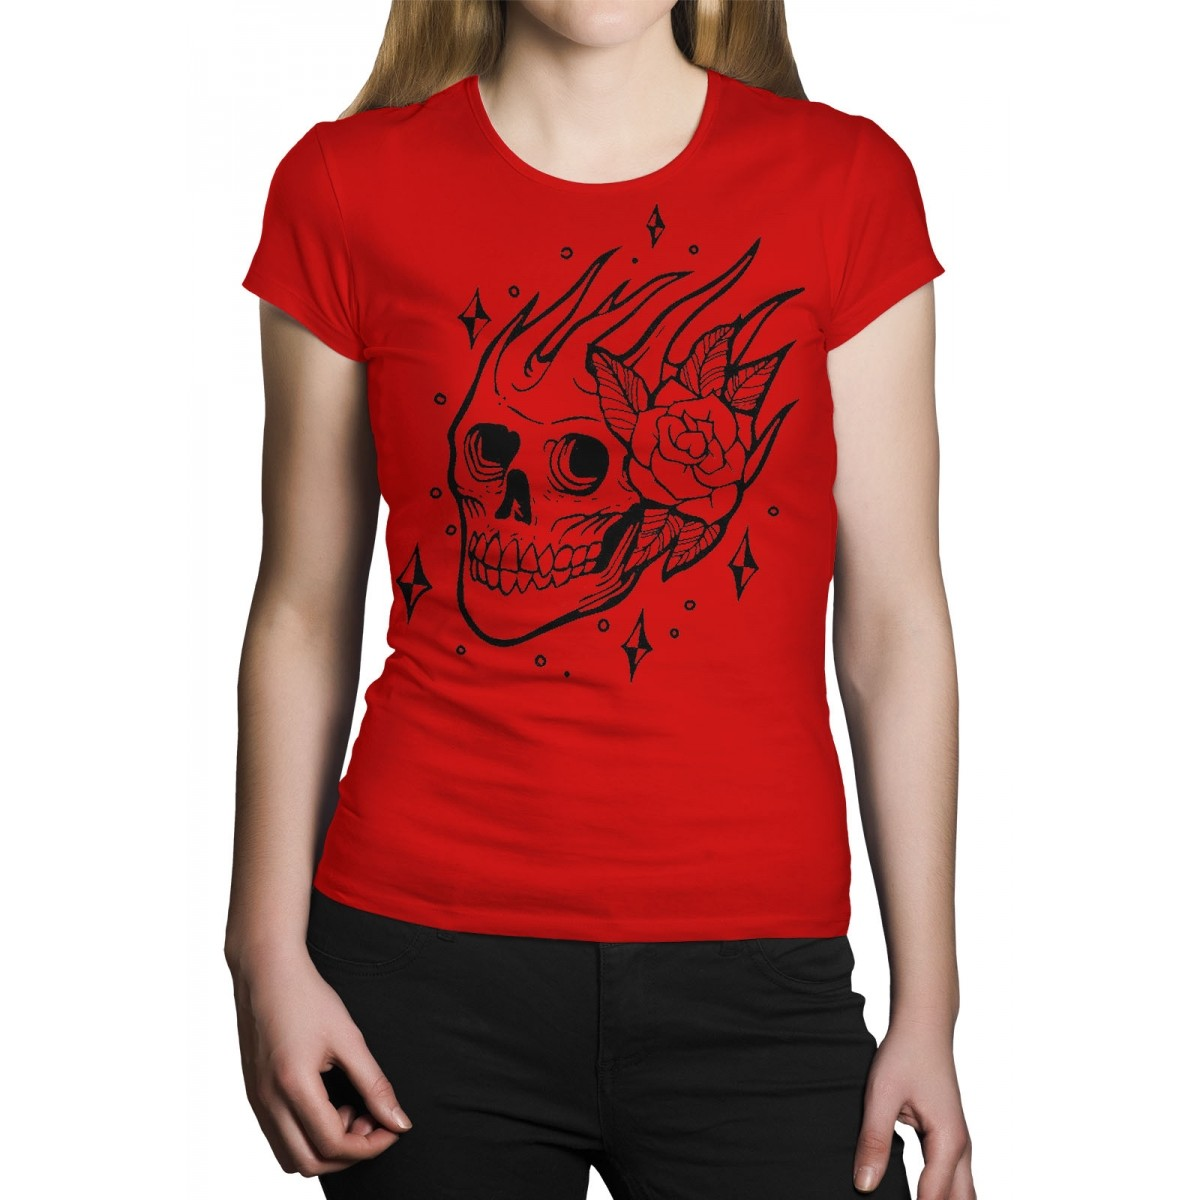 Camiseta HShop Skull Rose - Vermelha  - HShop